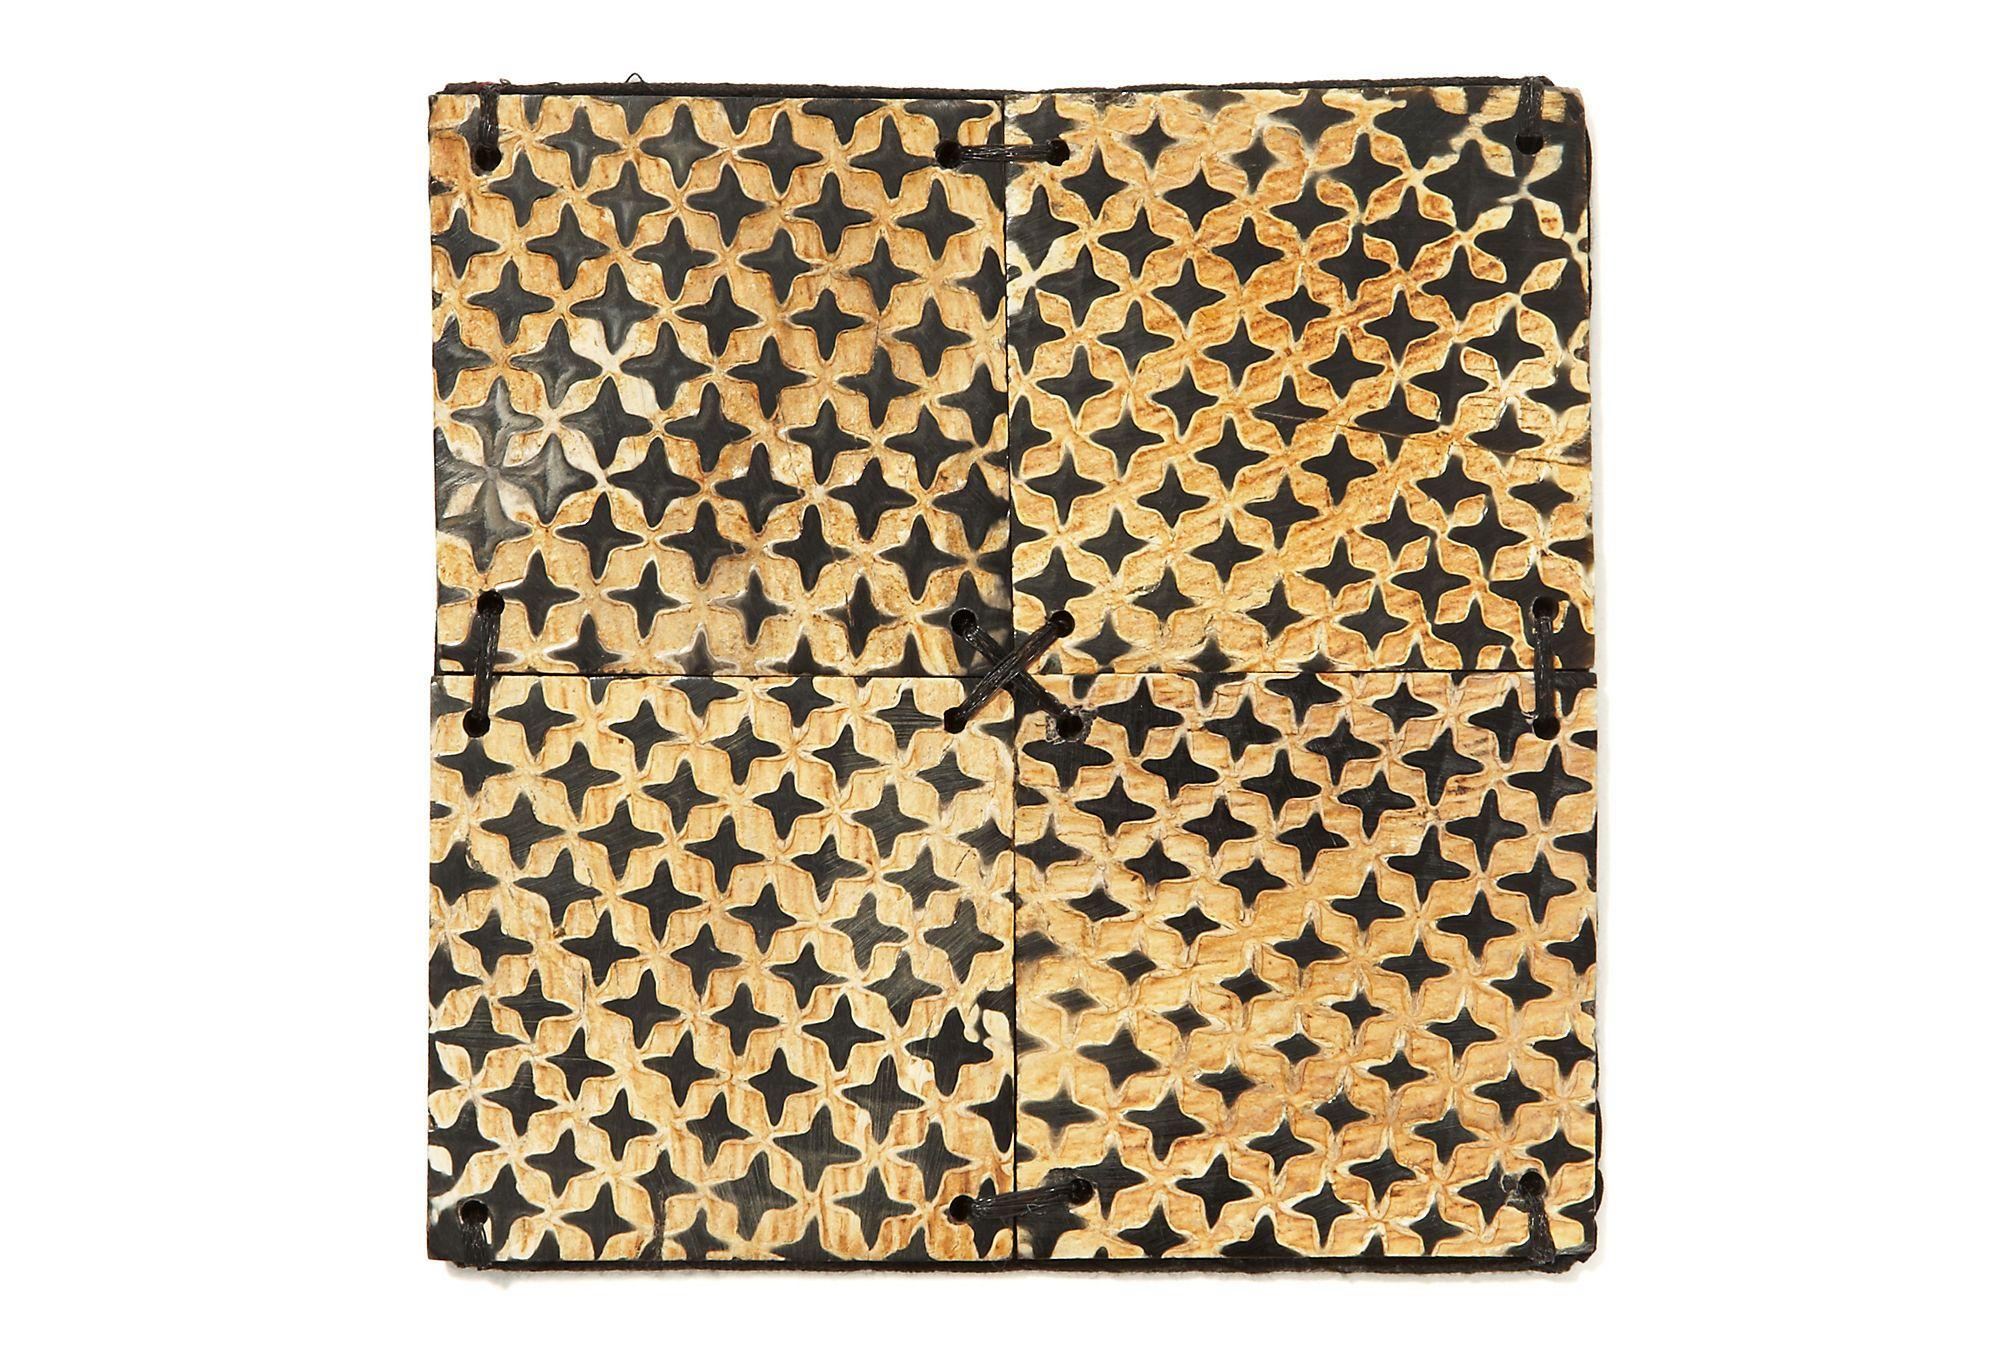 gold and black Patterned Burnt Horn Coaster - S/4